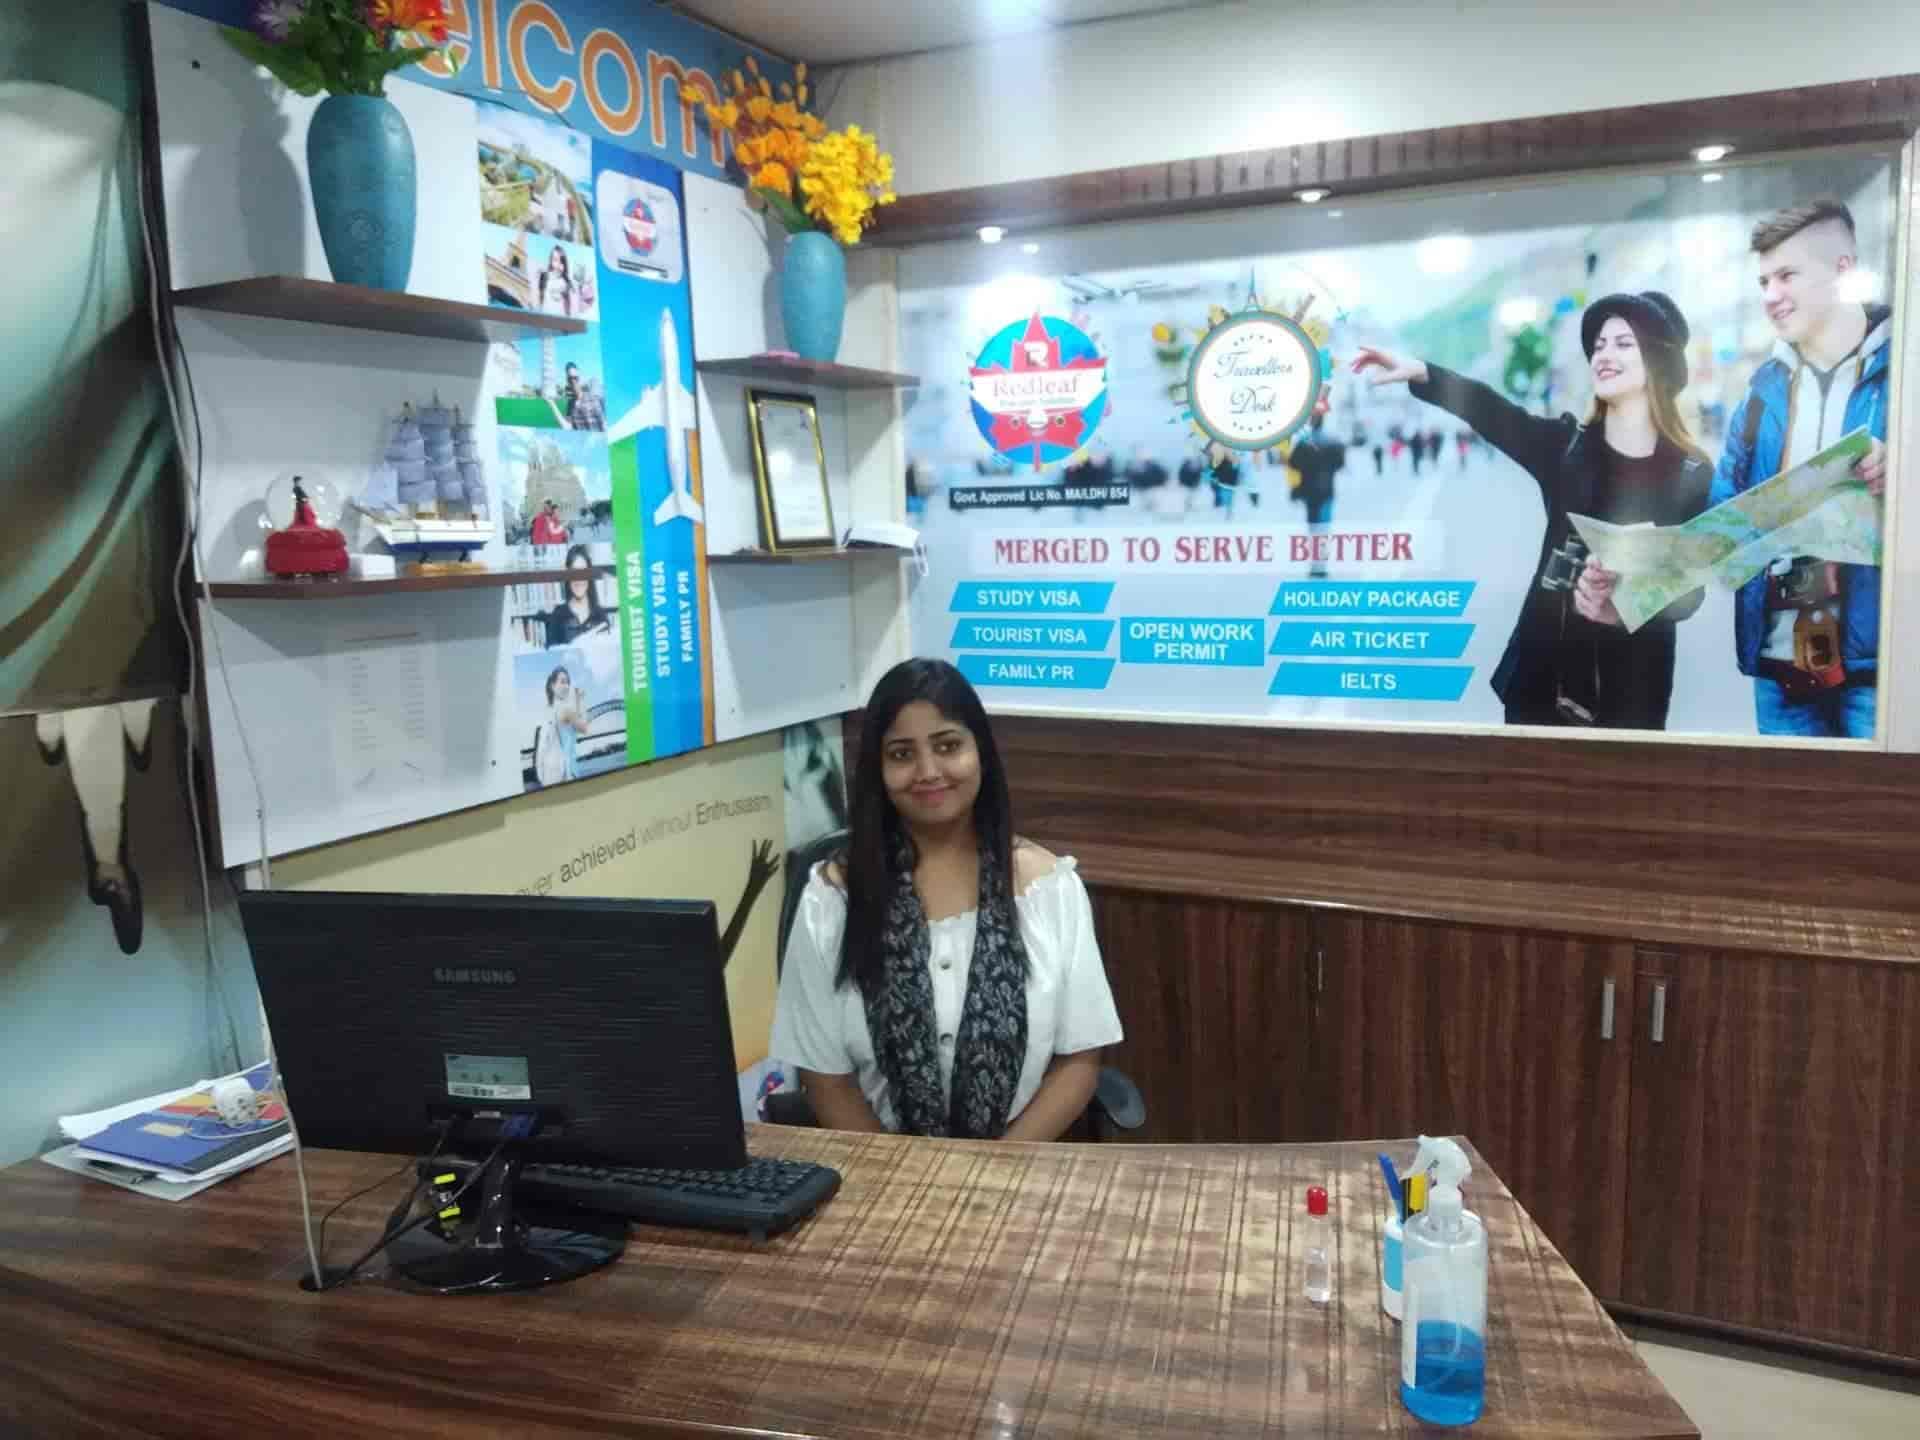 Red Leaf & Travellers Desk Pvt. Ltd., Bharat Nagar Chowk - Immigration  Consultants in Ludhiana - Justdial